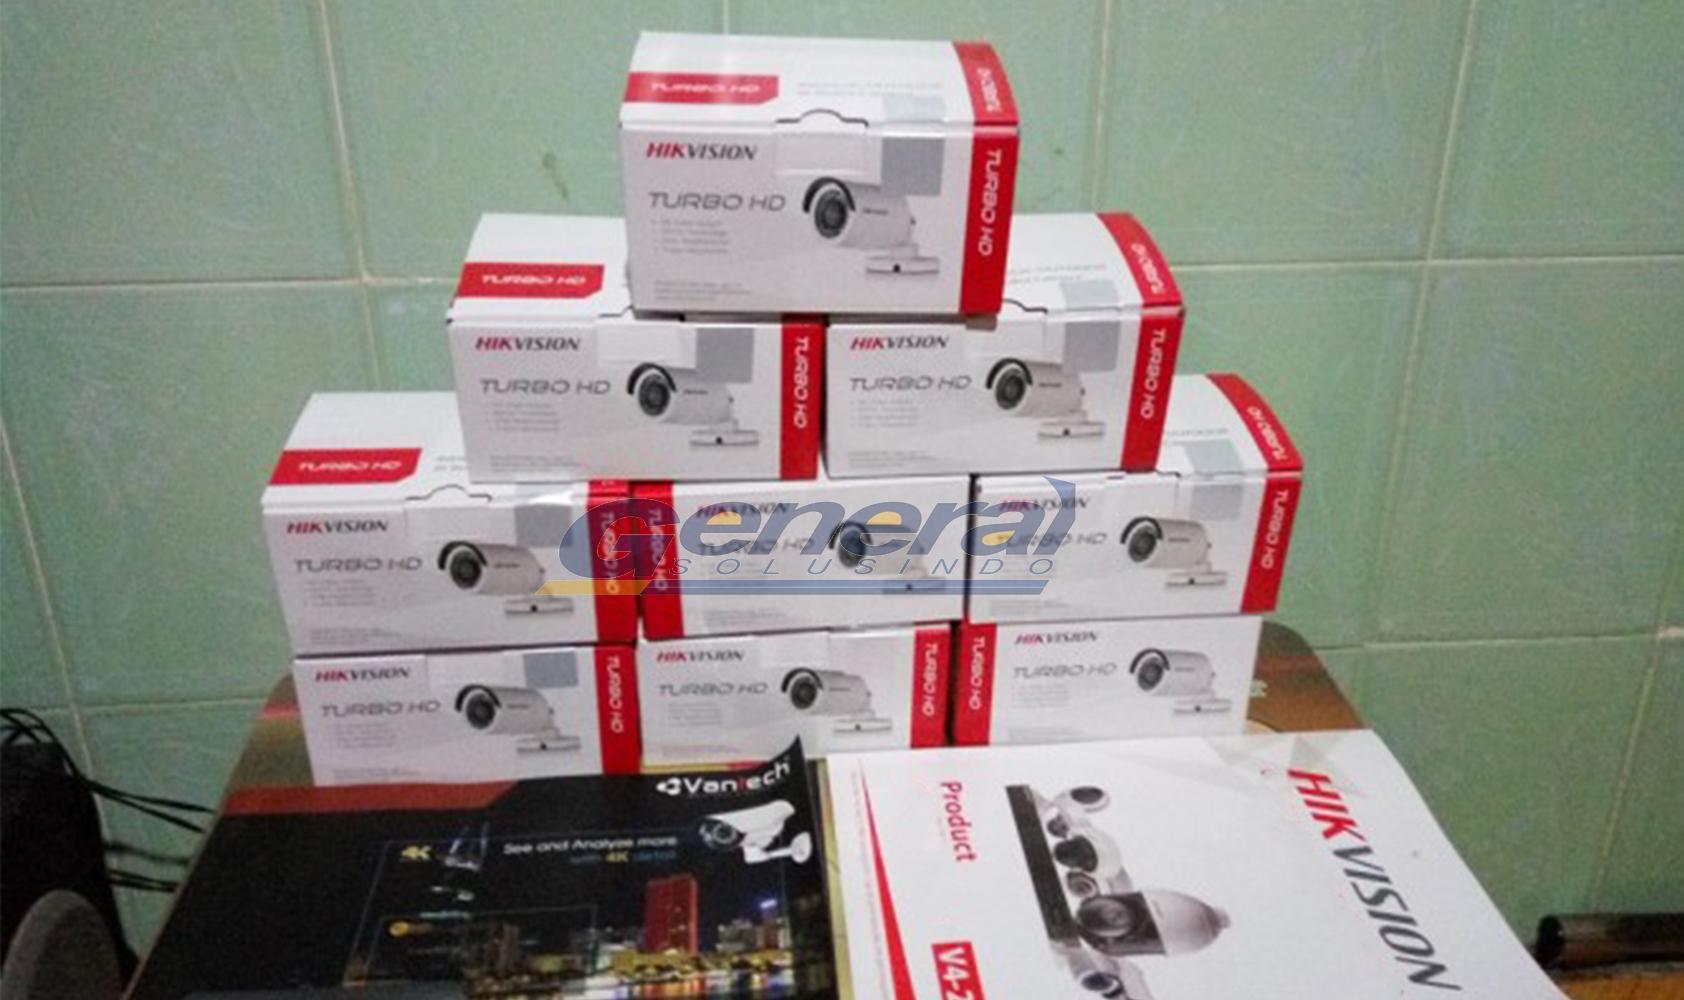 Paket-CCTV-murah-pasuruan-dan-mojokerto-2299987